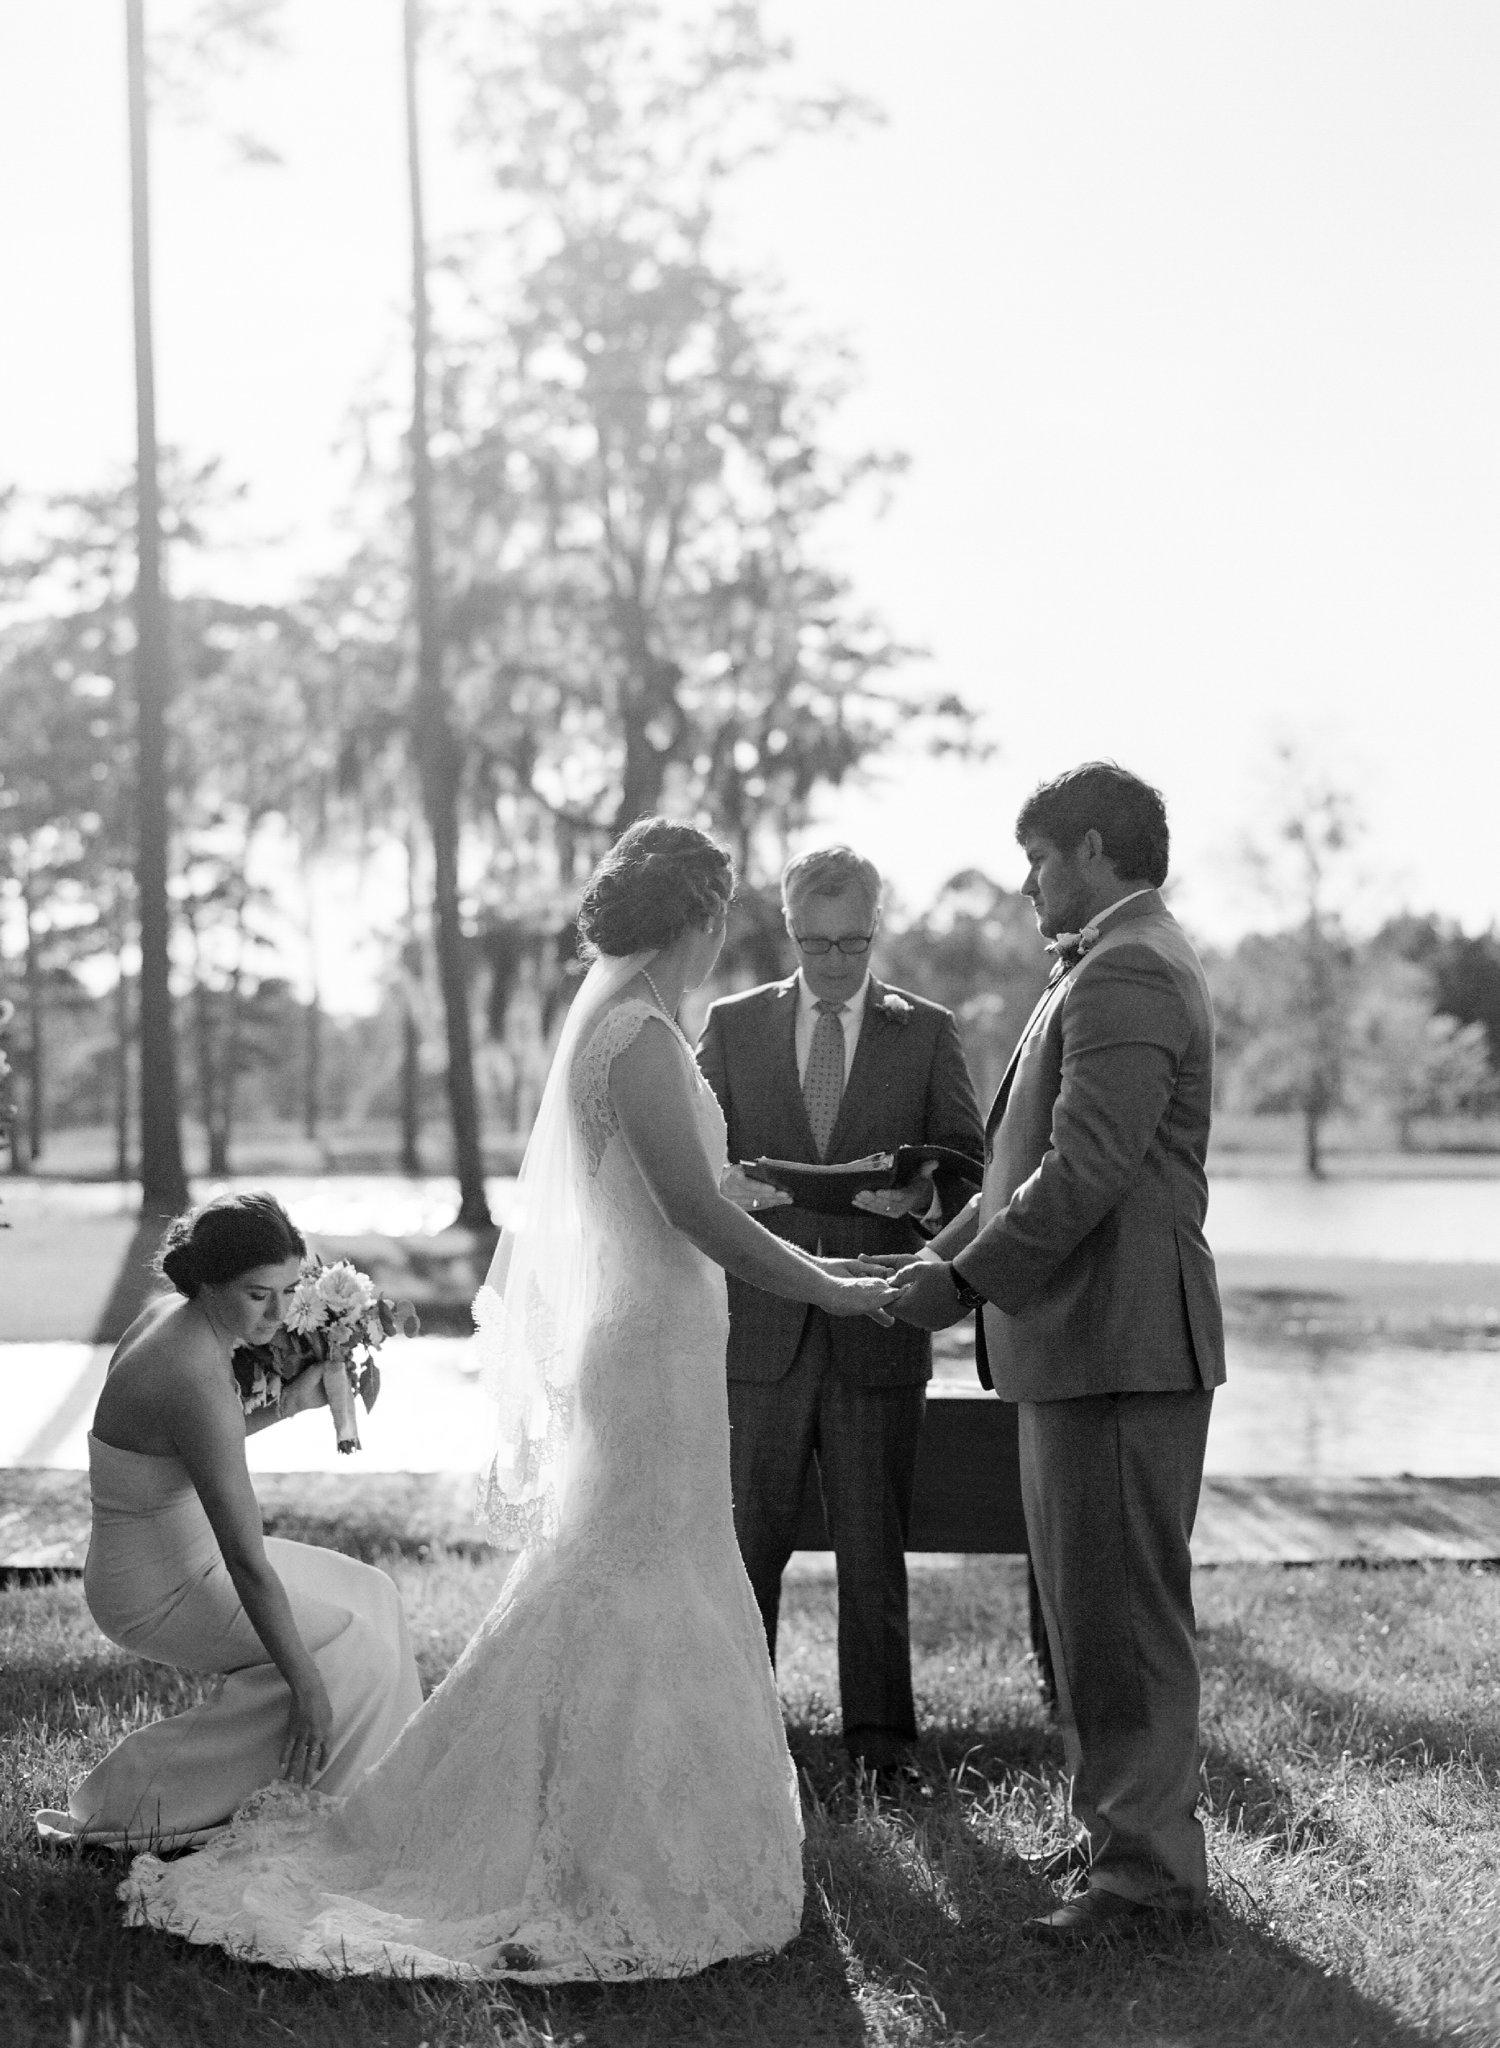 ecila farm wedding albany georgia wedding photographer shannon griffin photography-61.jpg